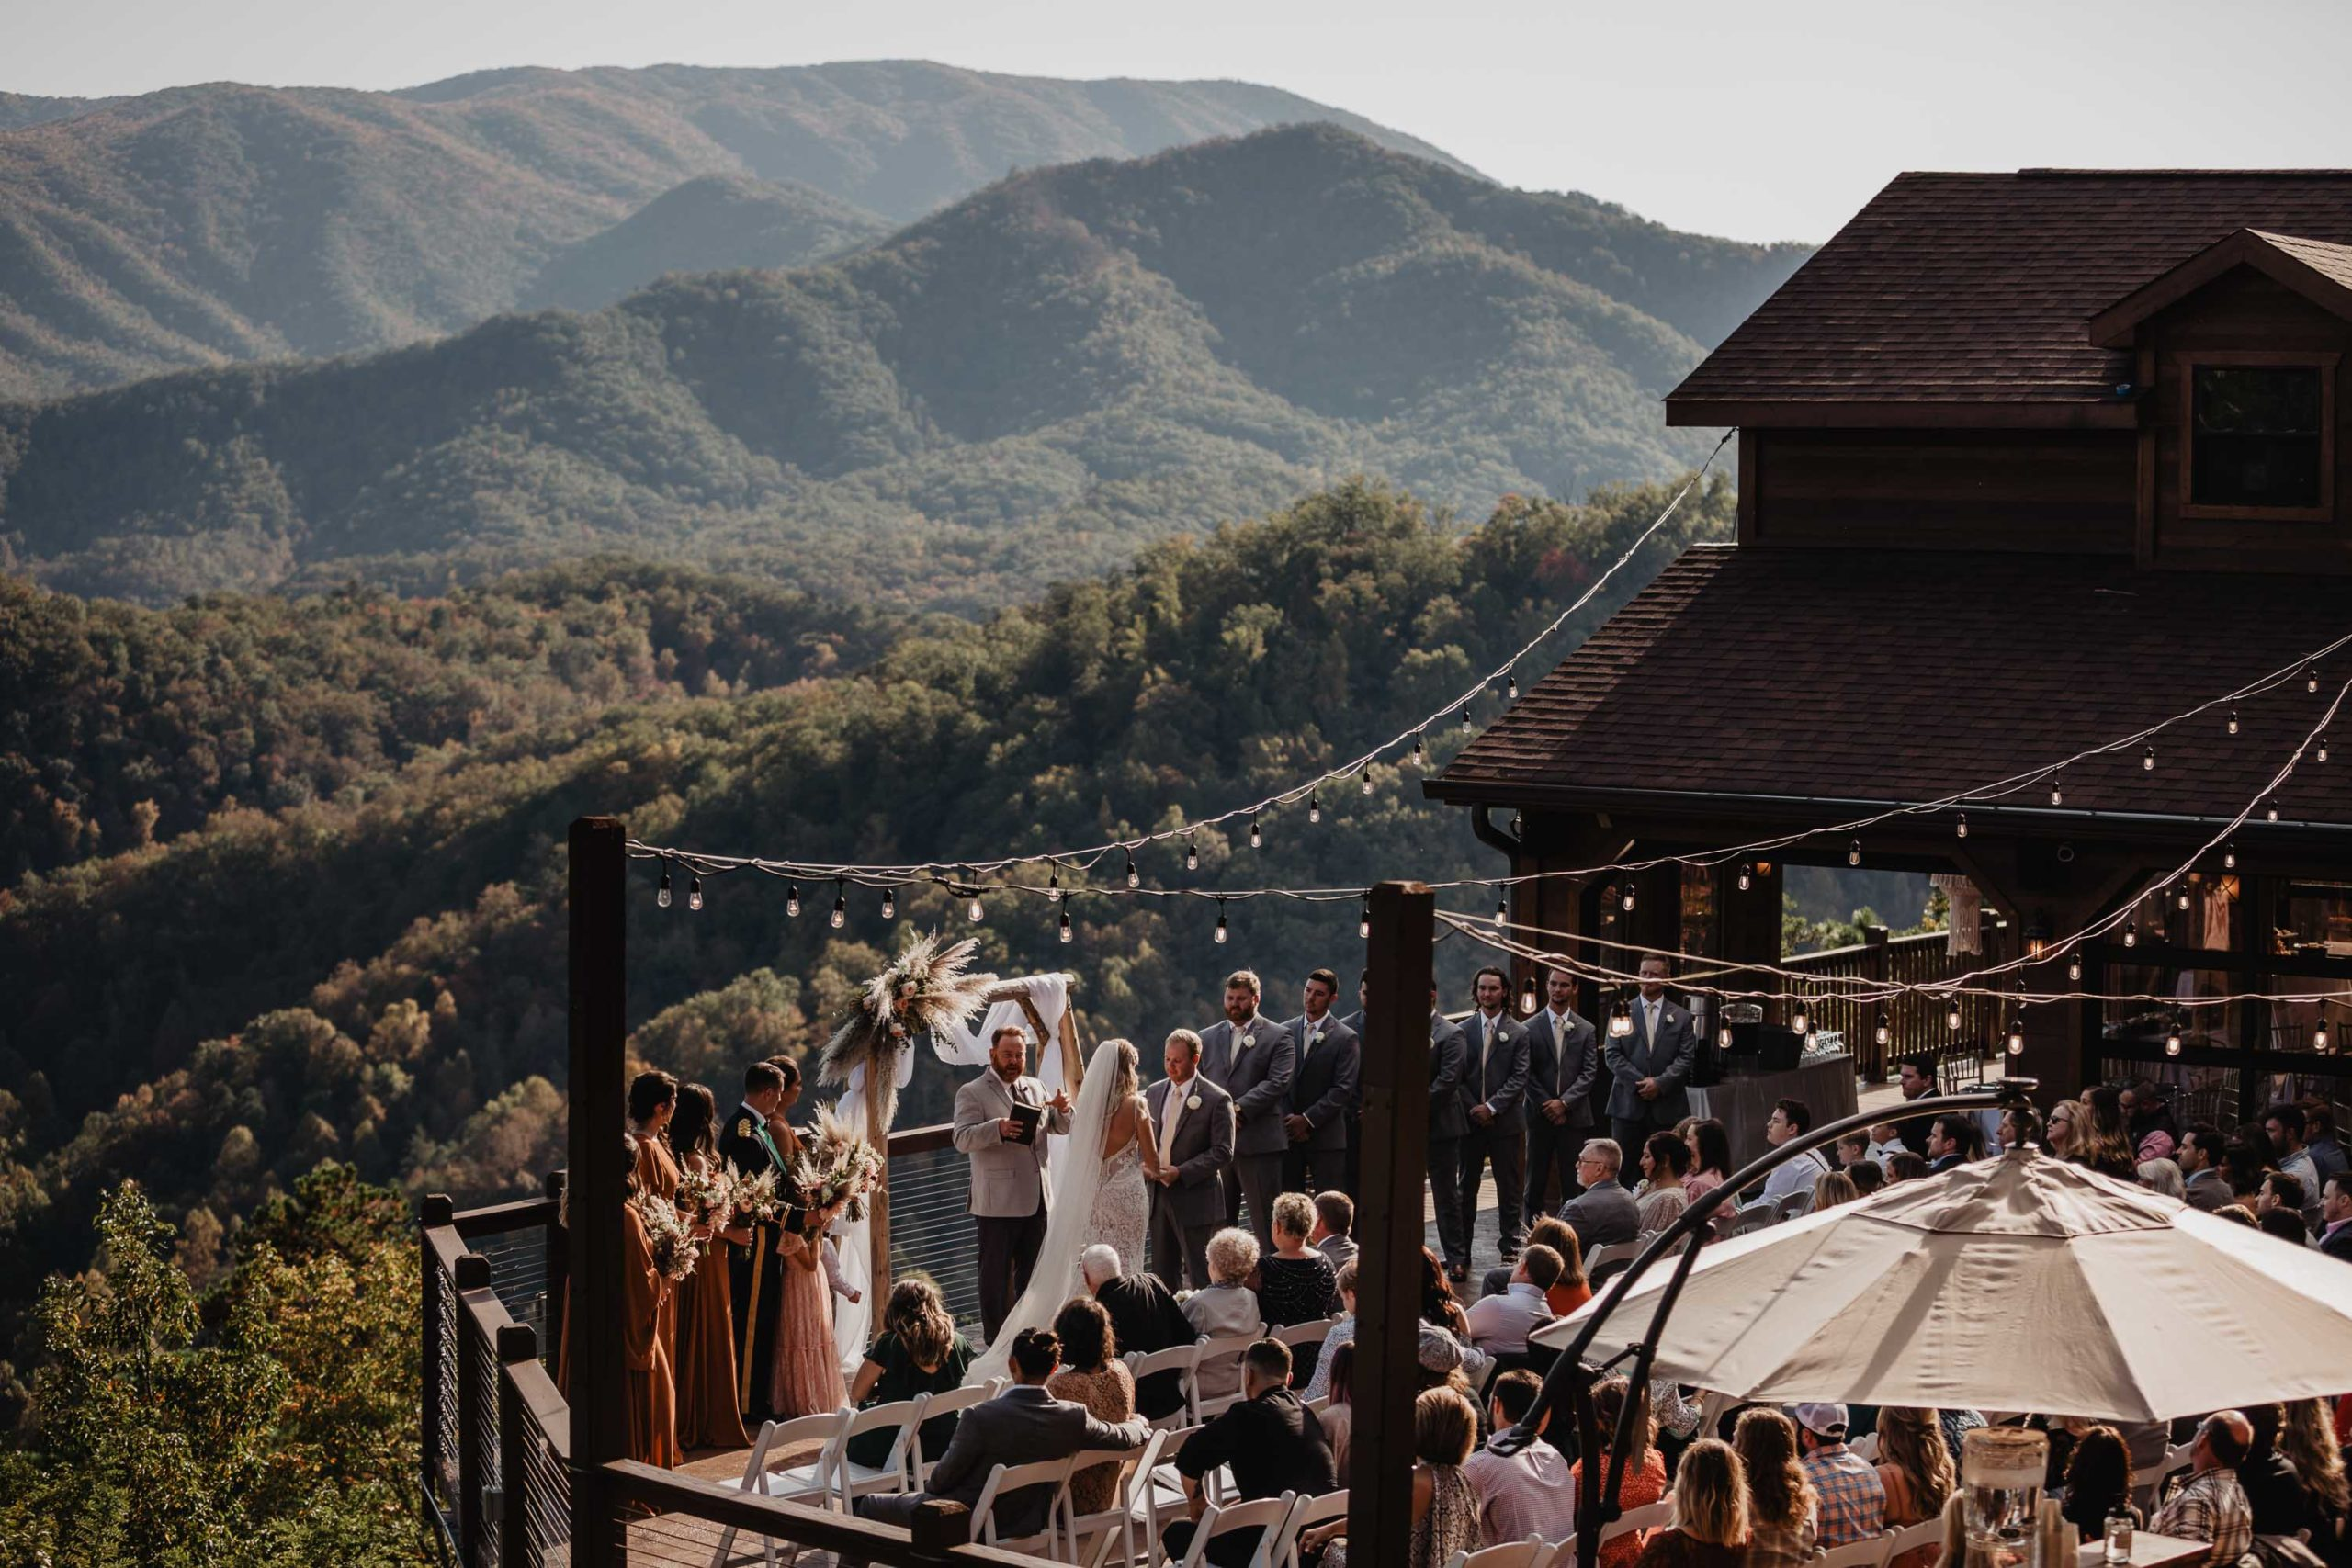 wedding ceremony at mountain top venue